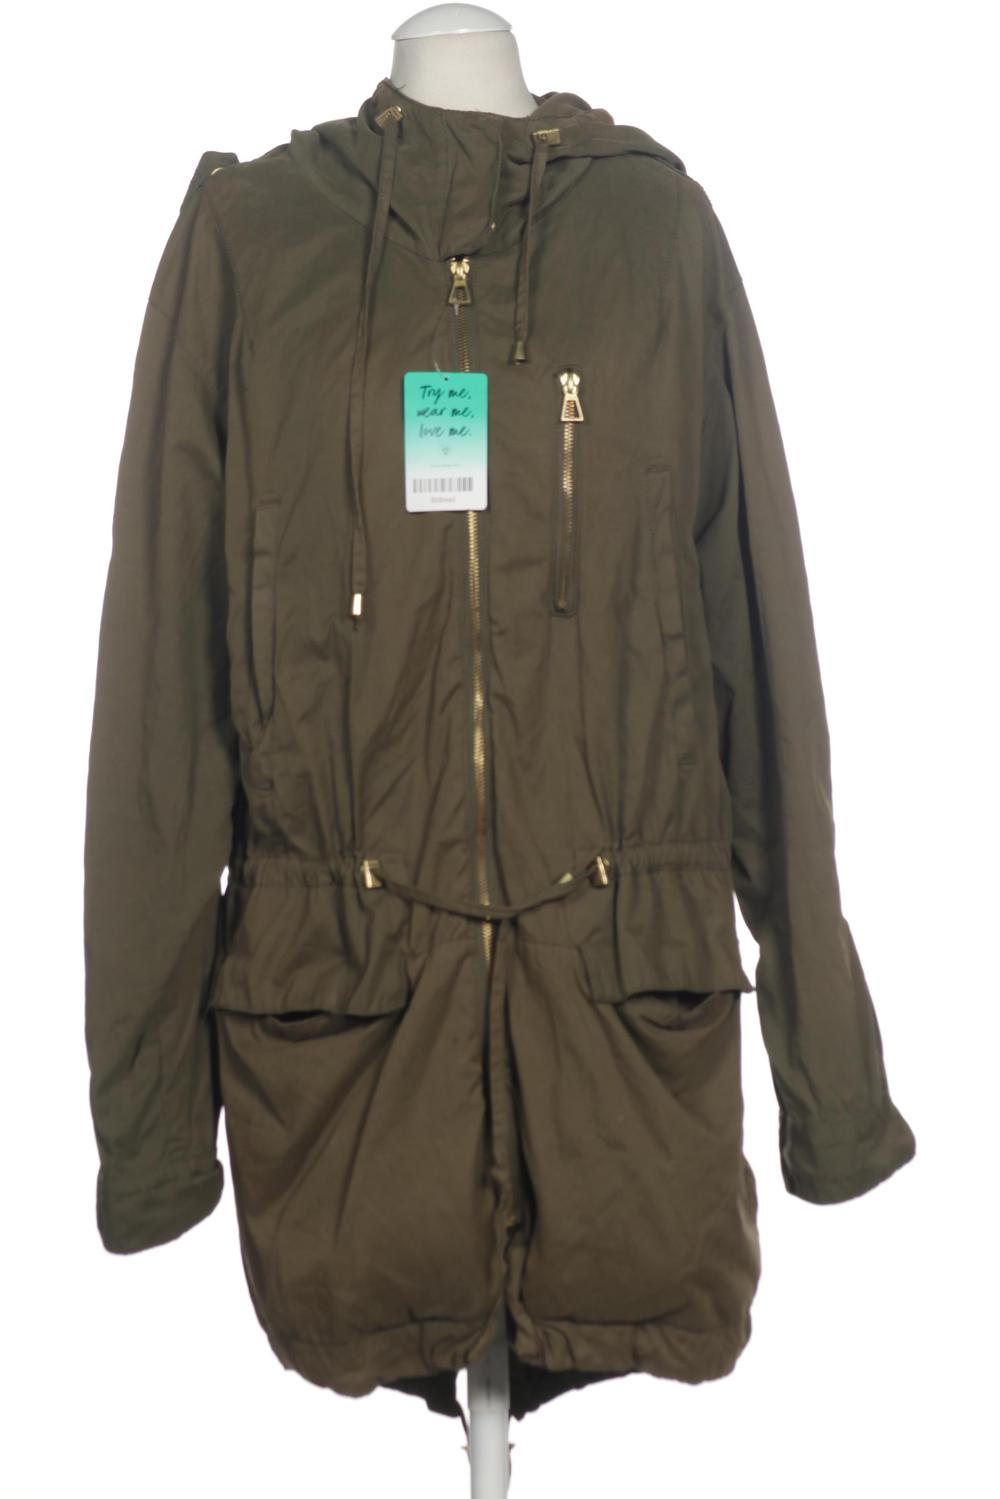 ZARA Mantel Damen Jacke Parka Gr. S Baumwolle grün #fddbead